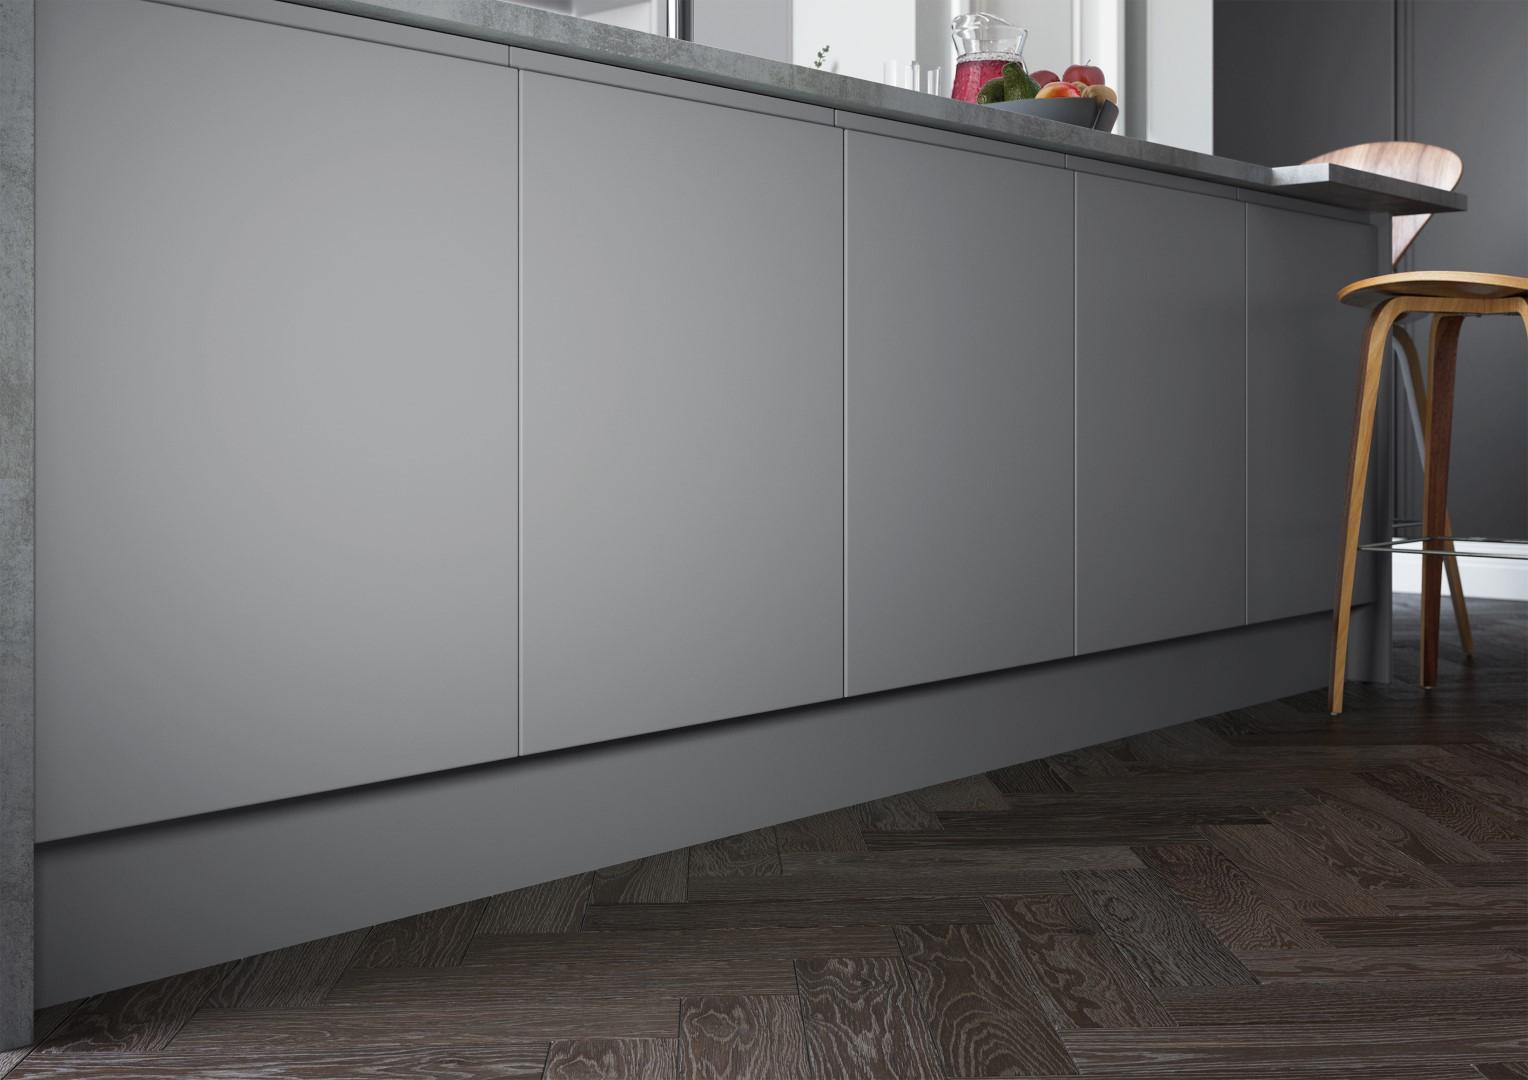 Strada Matte Light Grey and Dust Grey - Kitchen Design - Alan Kelly Kitchens - Waterford - 2